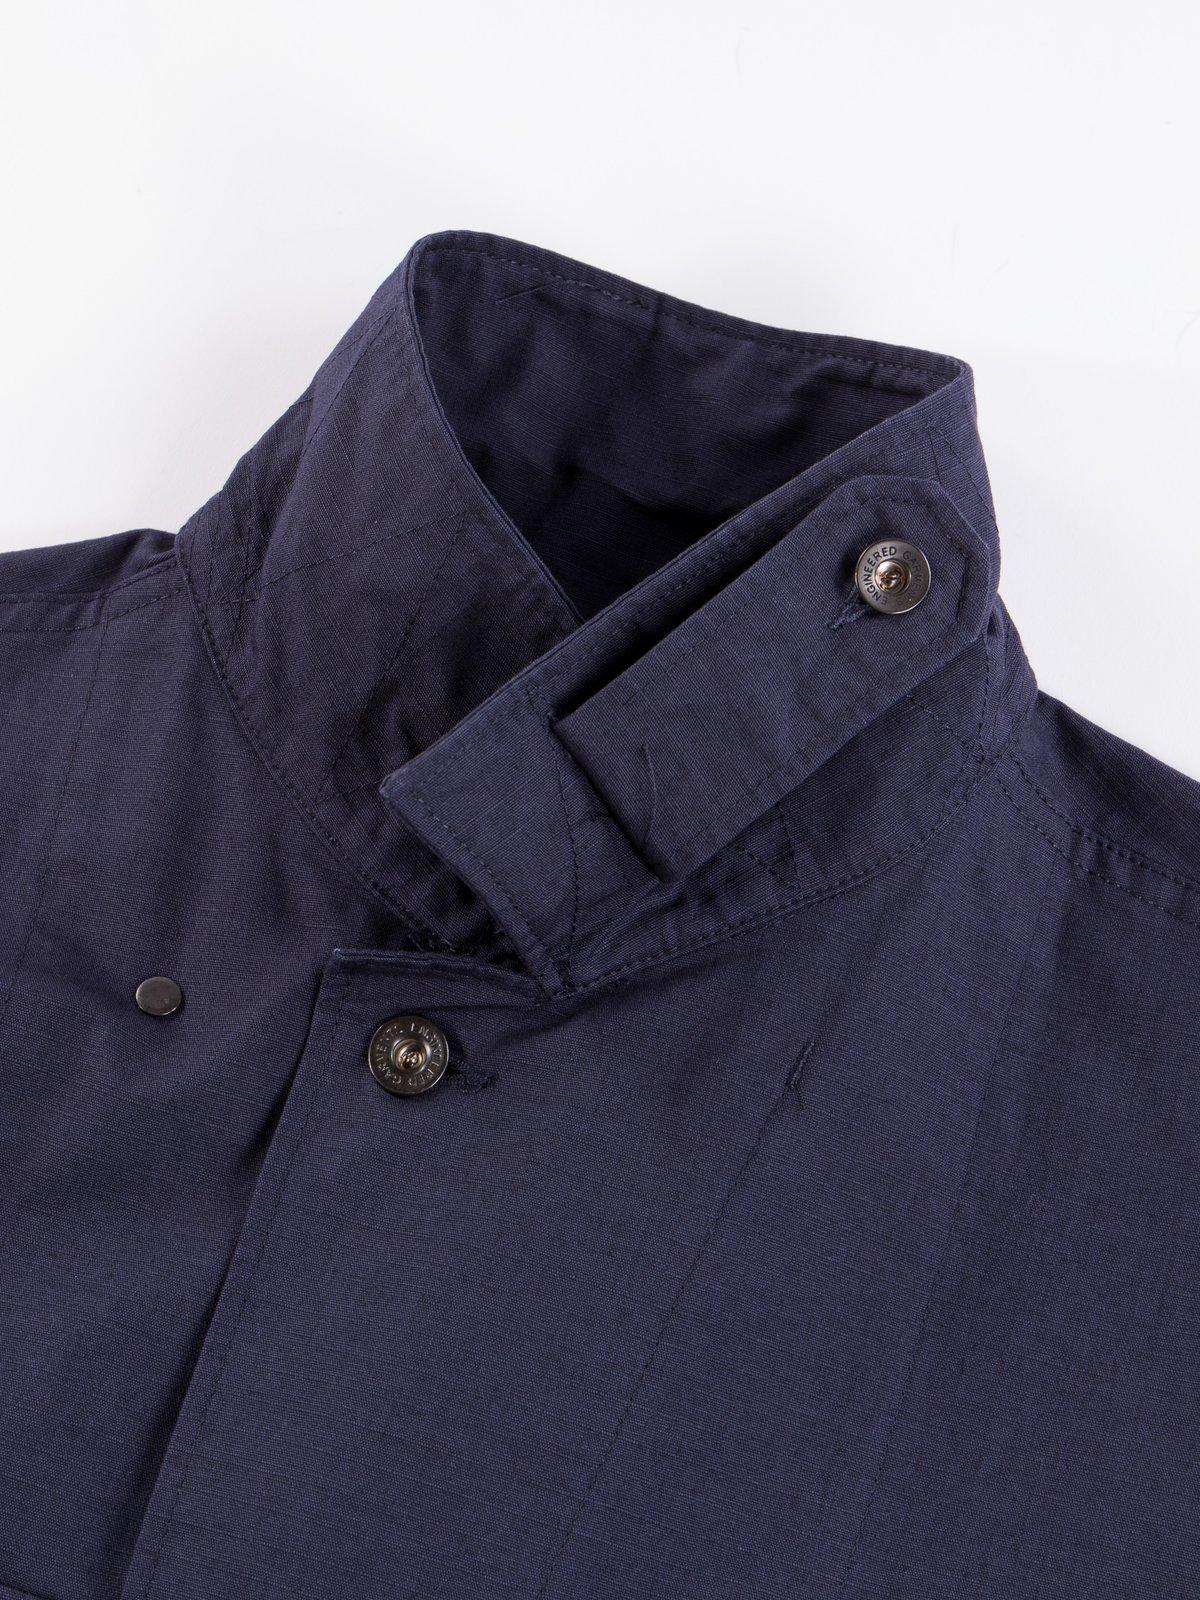 Dark Navy Cotton Ripstop M43/2 Shirt Jacket - Image 7